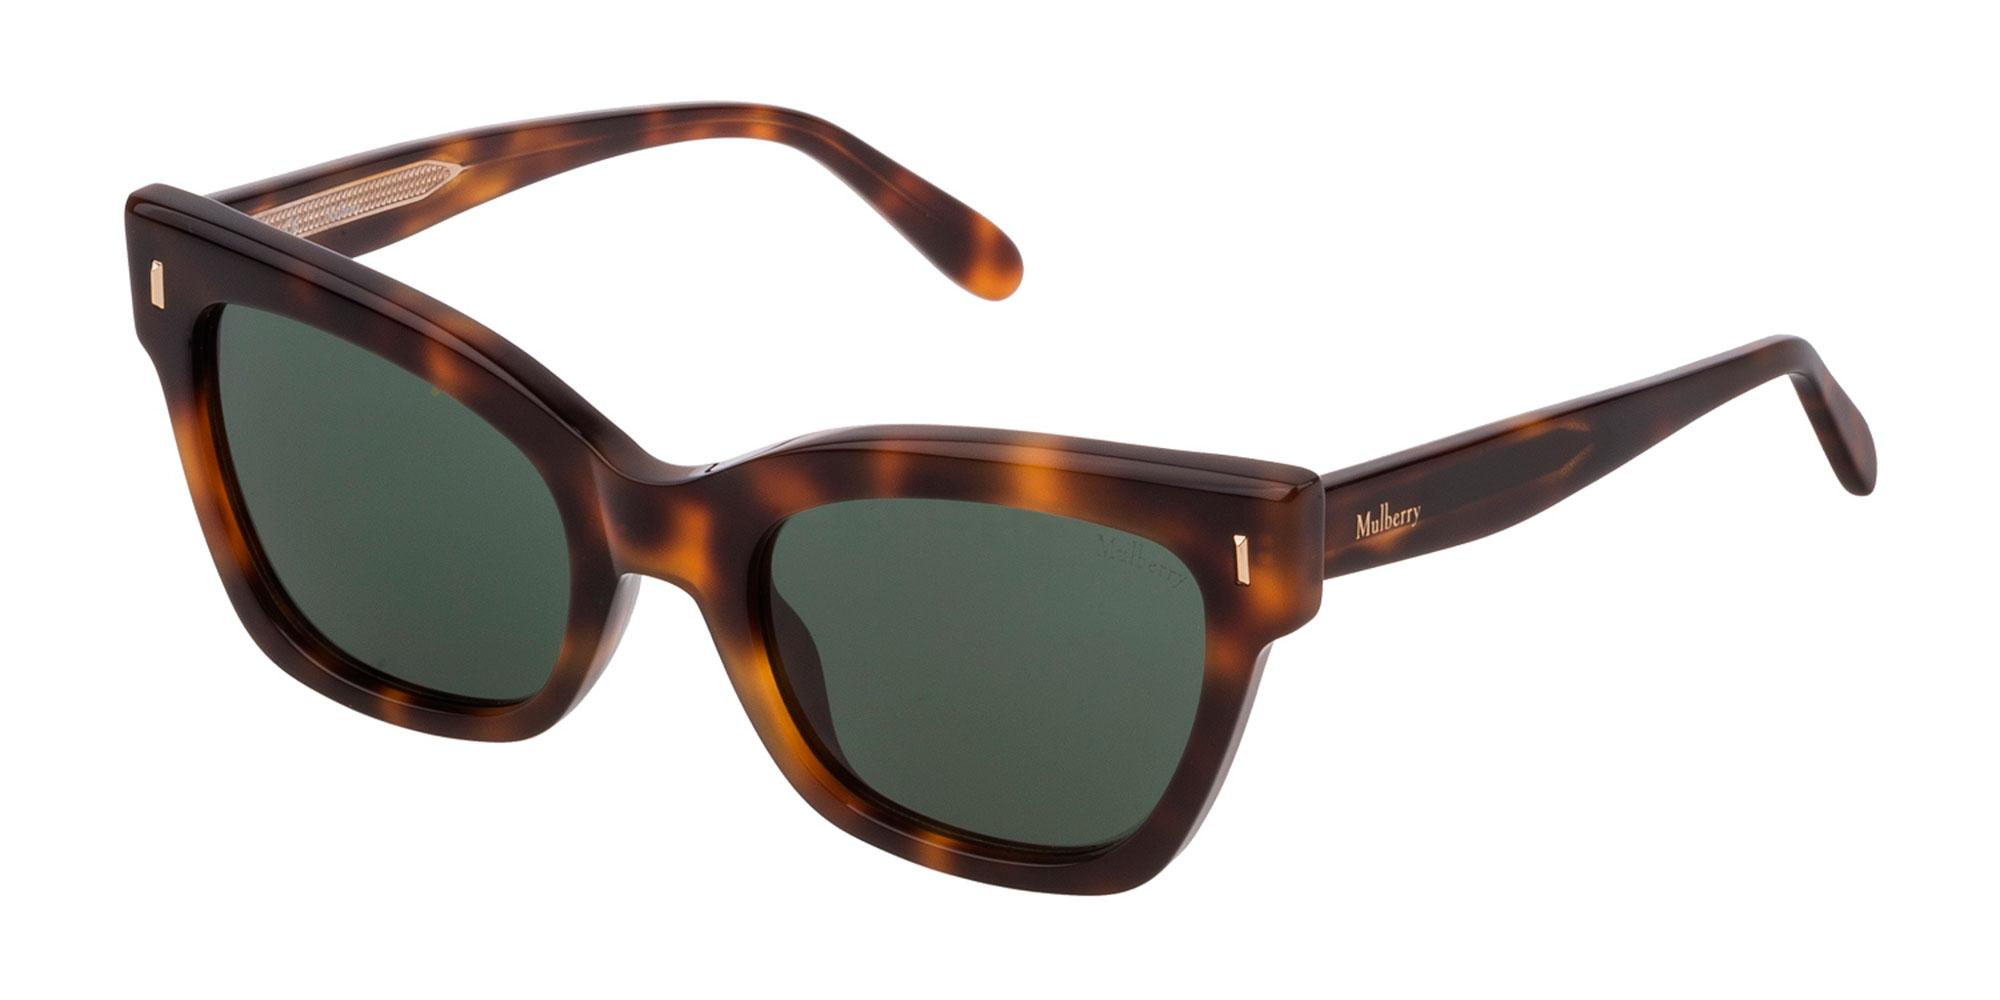 09AJ SML003 Sunglasses, Mulberry